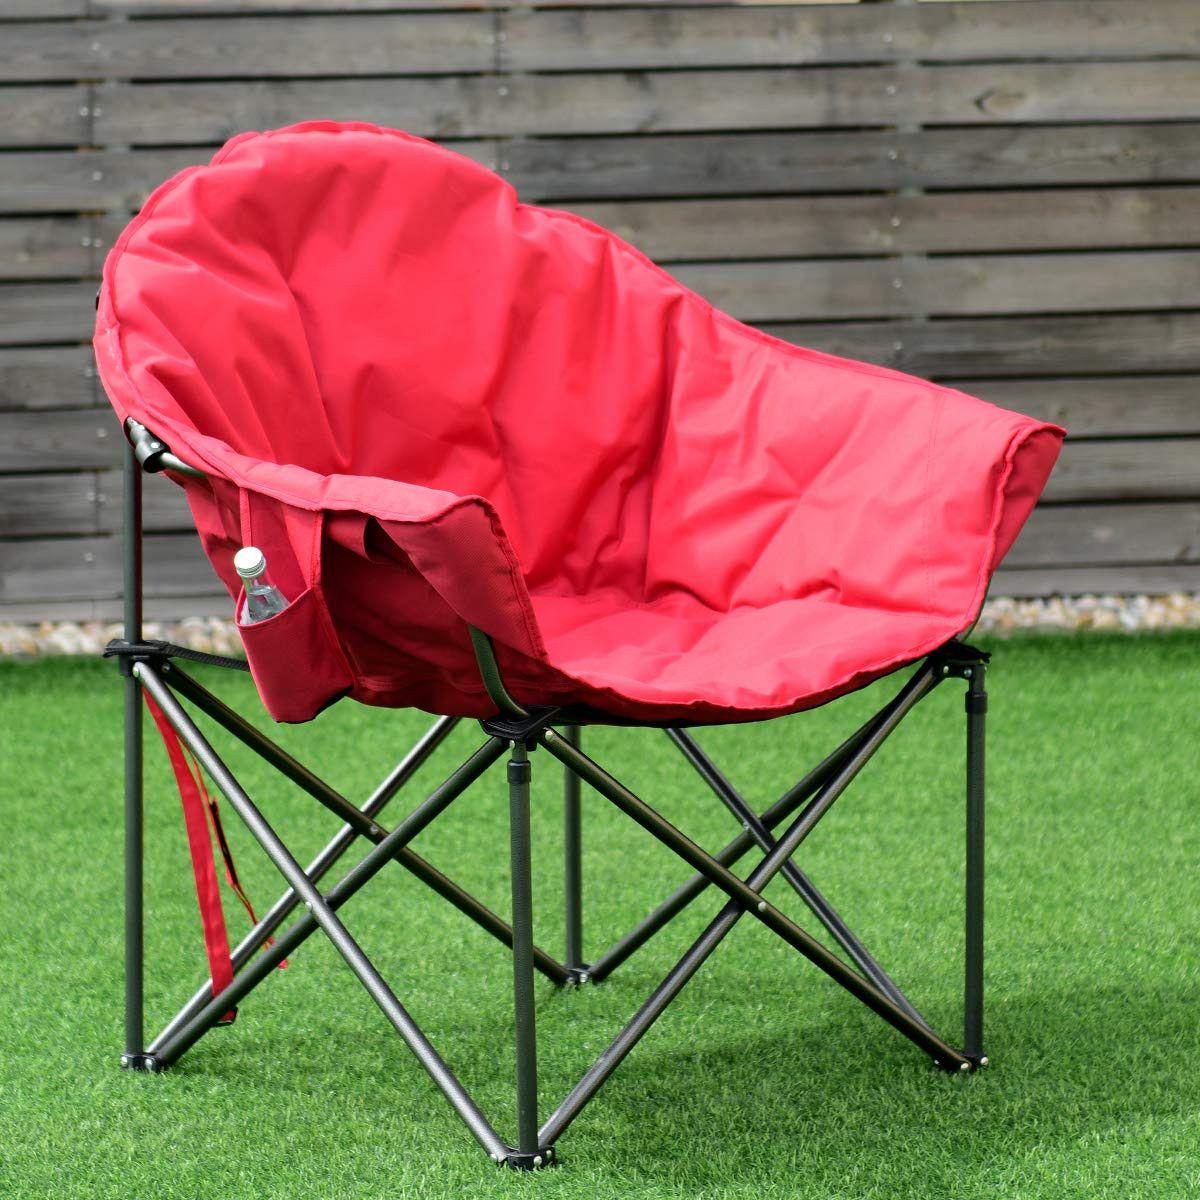 Giantex Folding Moon Saucer Chair Portable Camping Chair